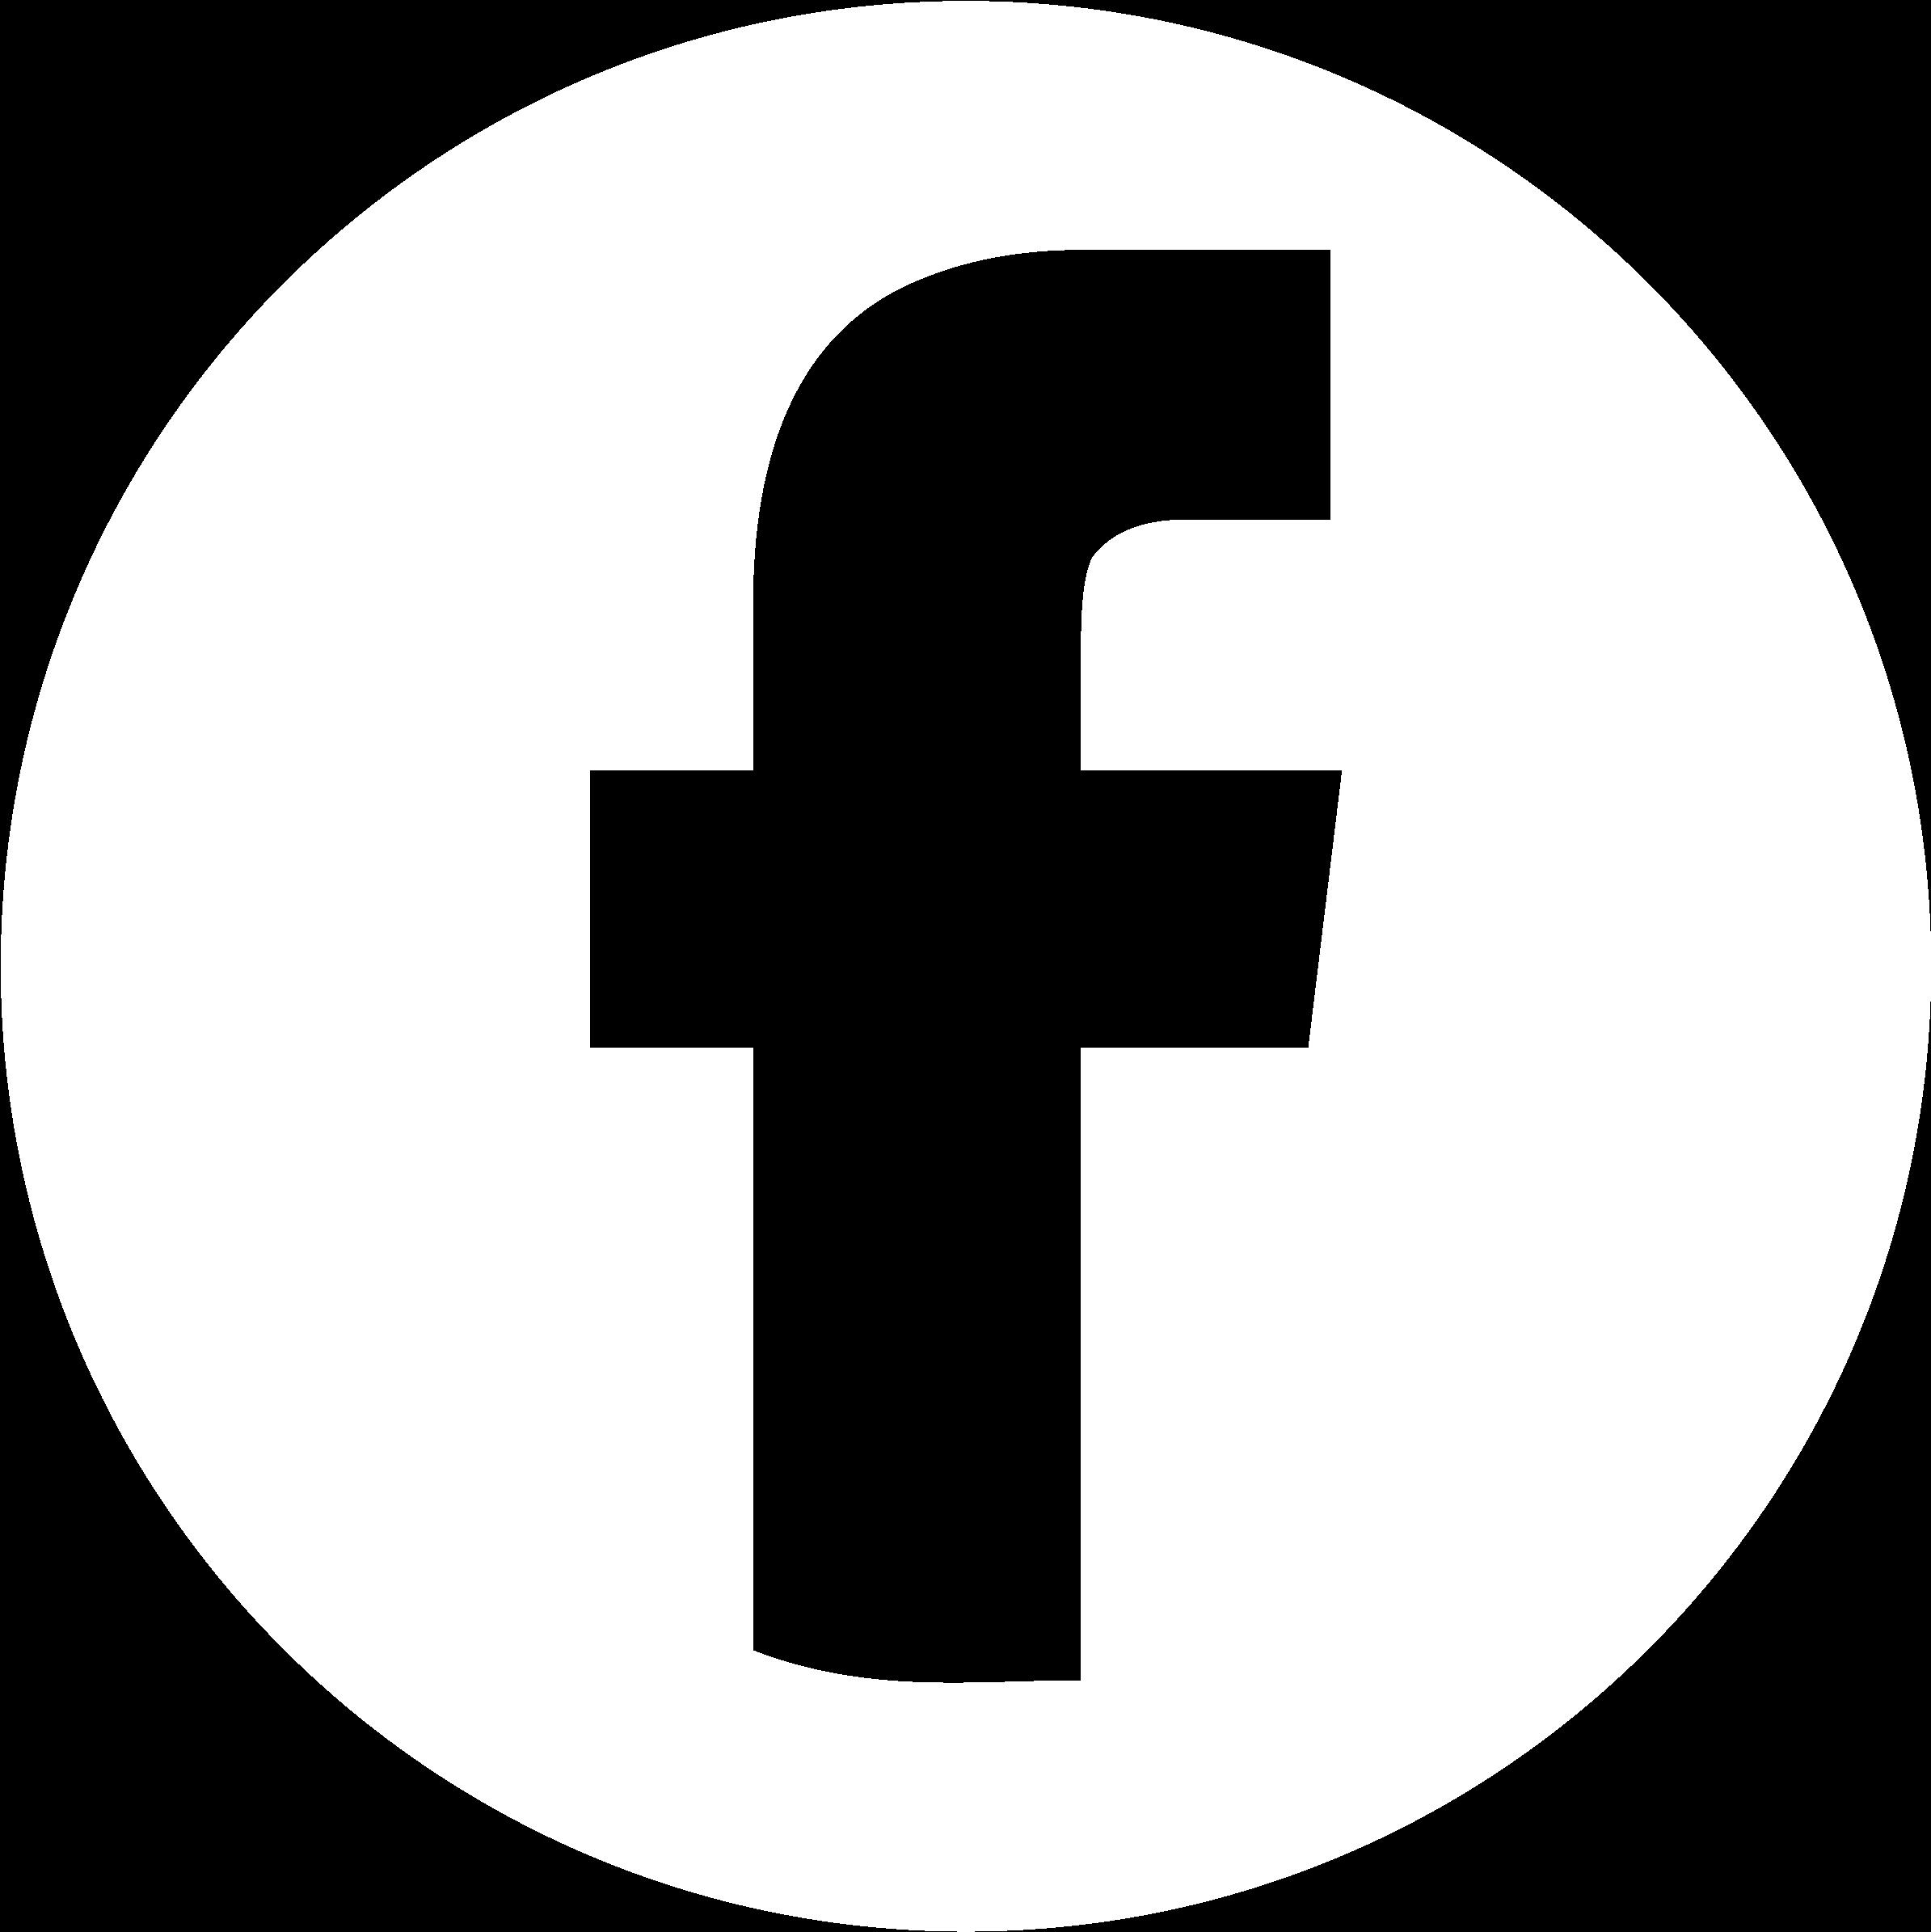 Facebook White Circle - Logo Facebook Noir Et Blanc Rond (2827x2539), Png Download